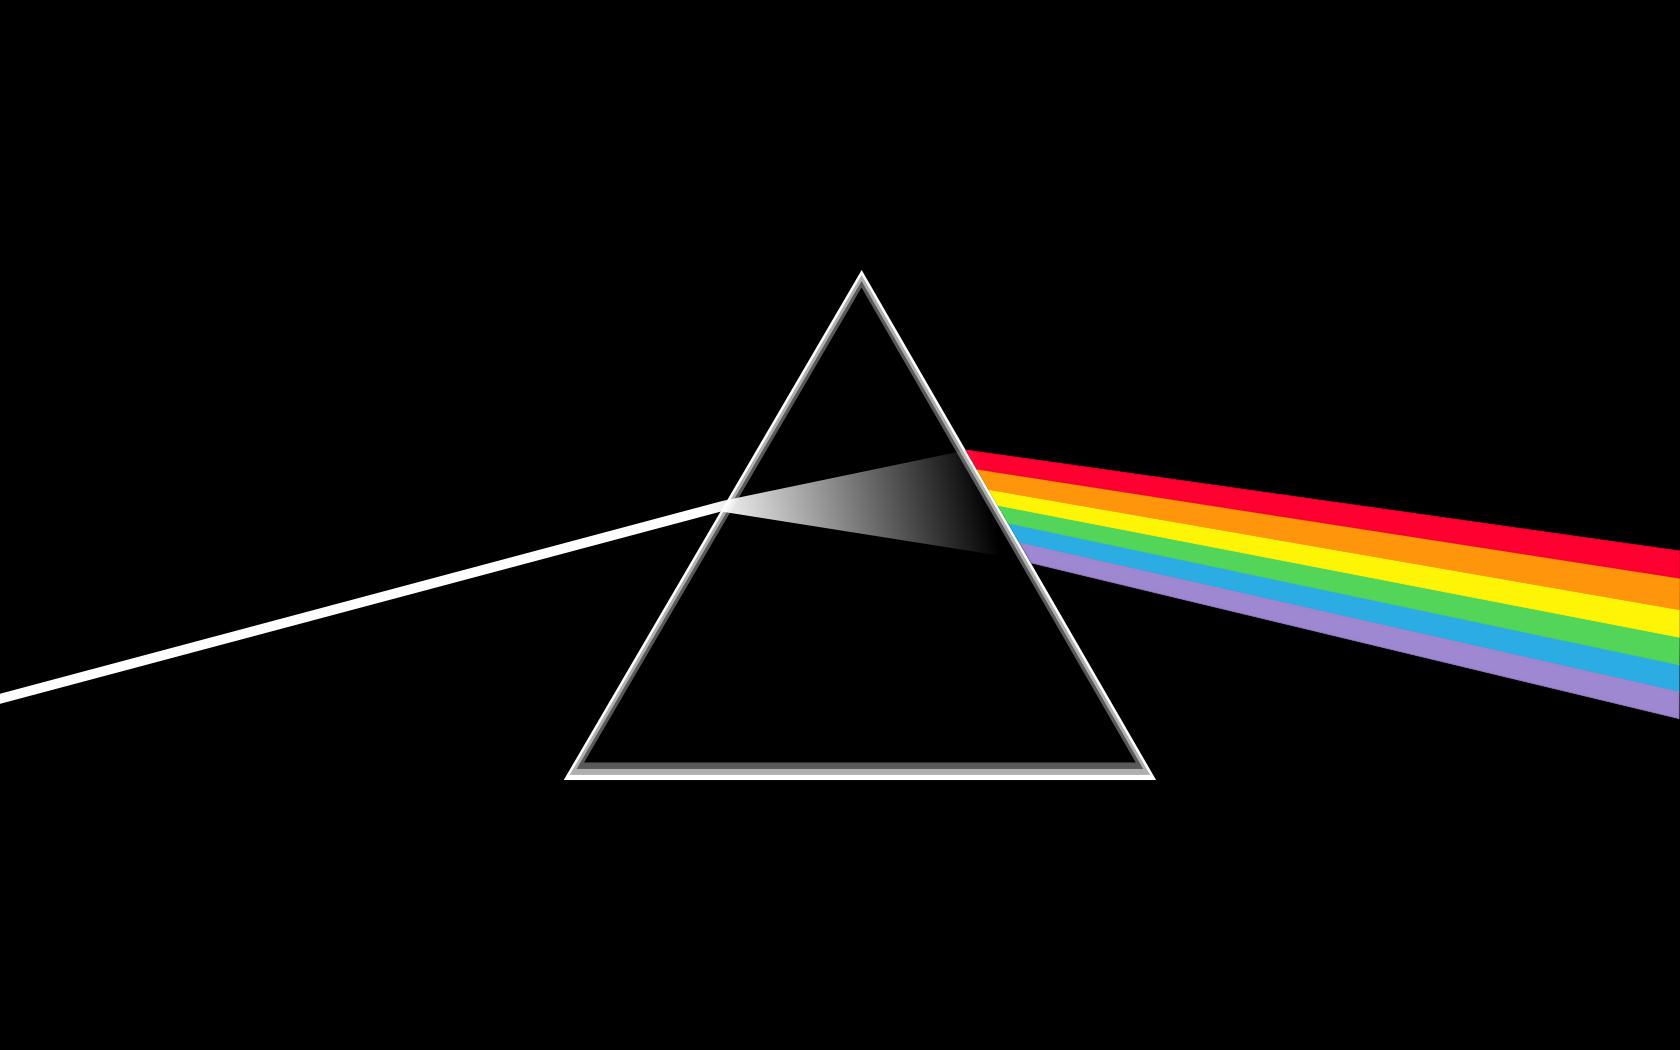 Pink Floyd Wallpaper 1680x1050 Pink Floyd The Dark Side Of The 1680x1050